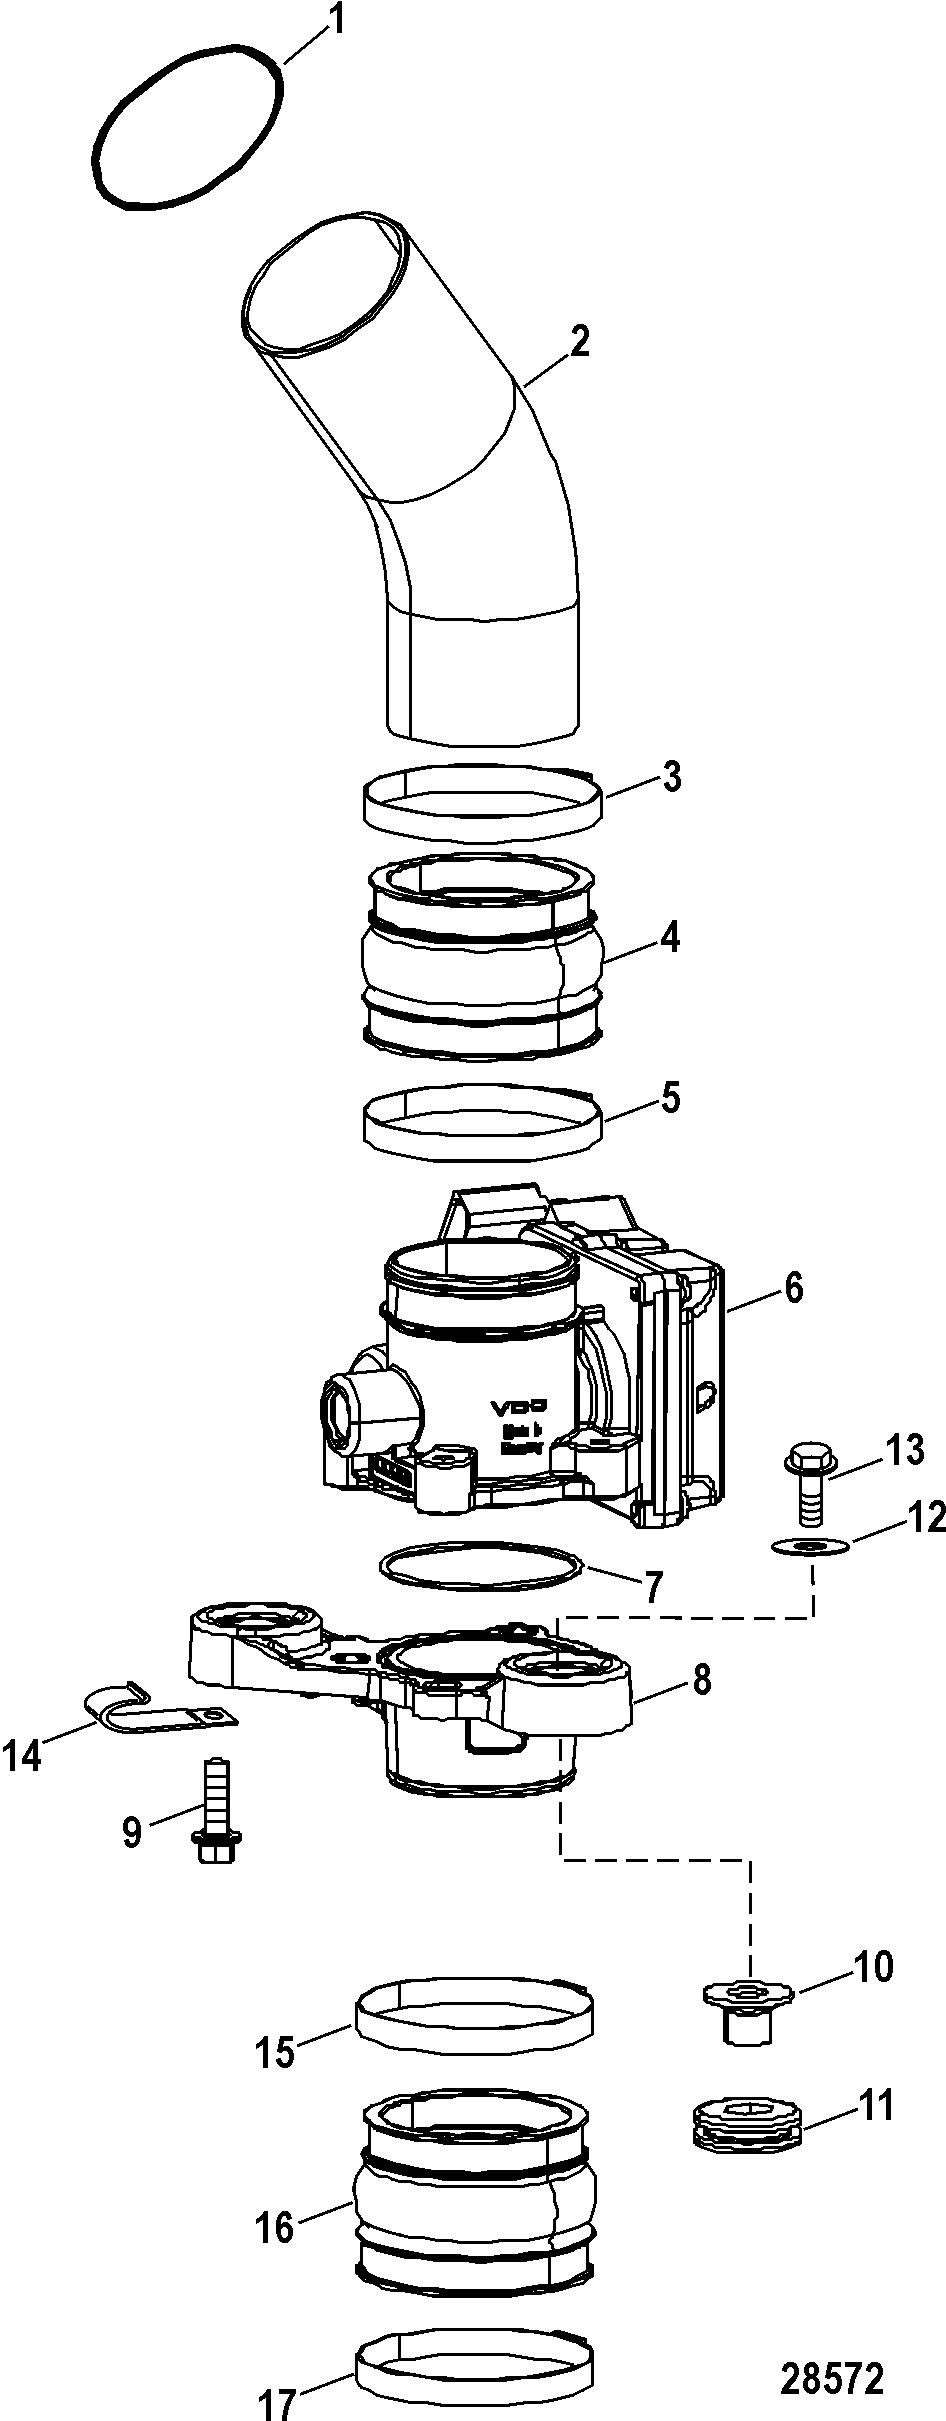 Каталог запчастей RACE STERNDRIVE 1075 SCi 0M957032 THRU